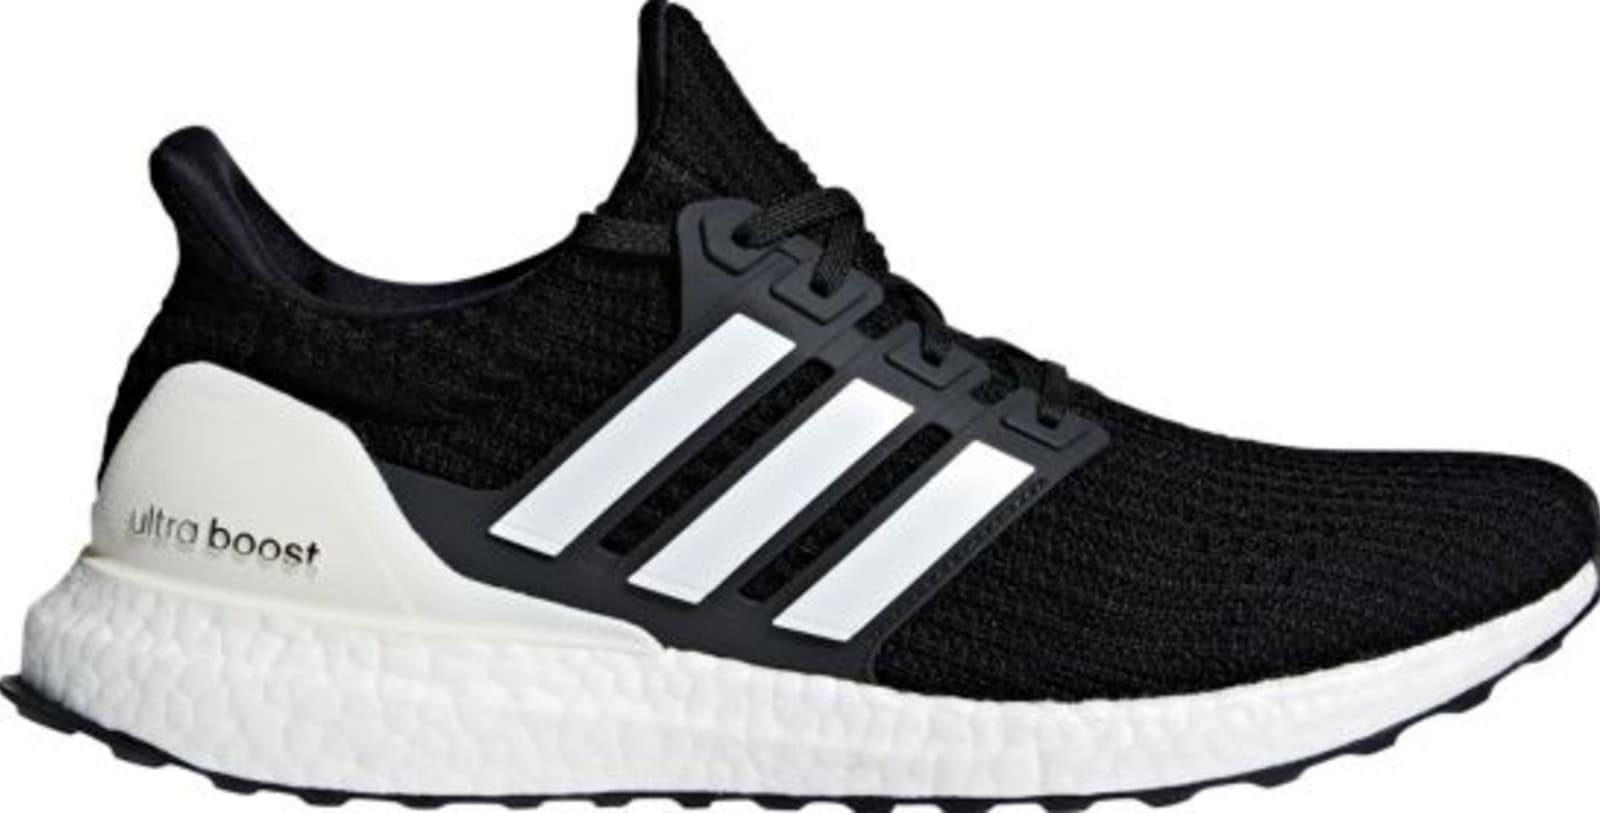 7489fd88e72 Adidas Ultra Boost - Sneaker Sales August 17